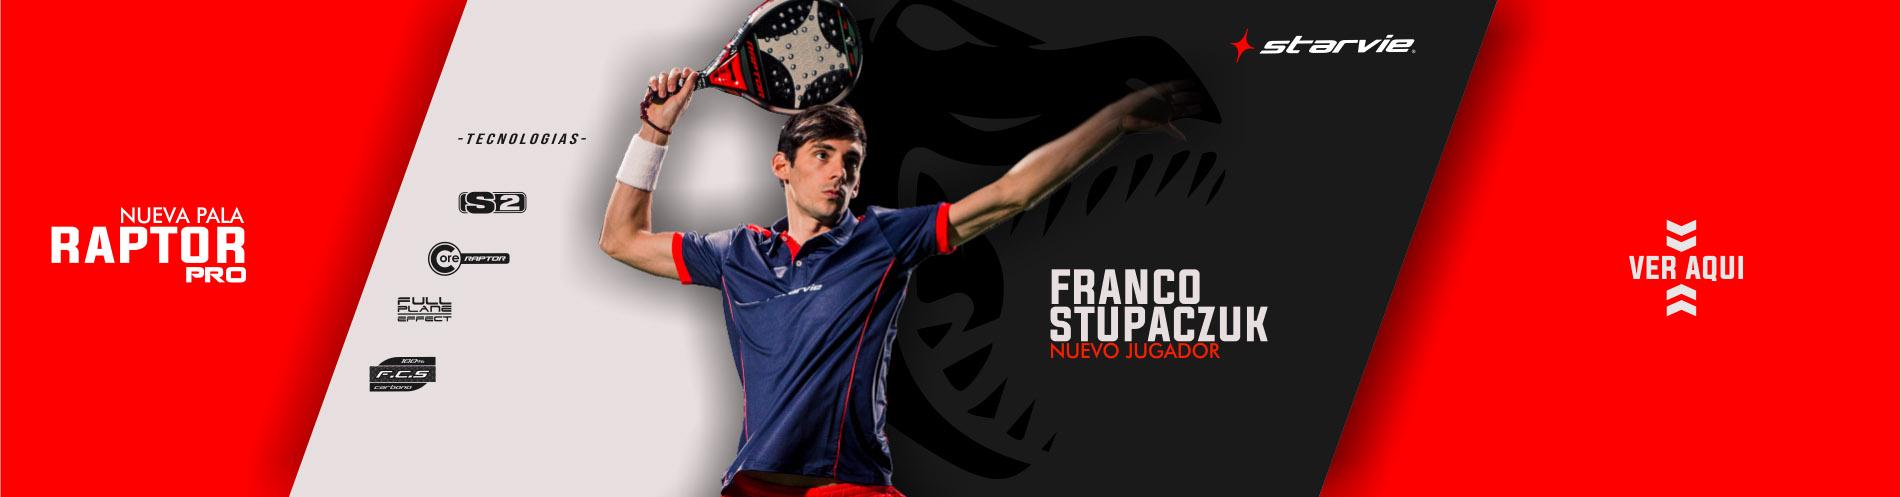 Fichaje Franco Stupaczuk StarVie